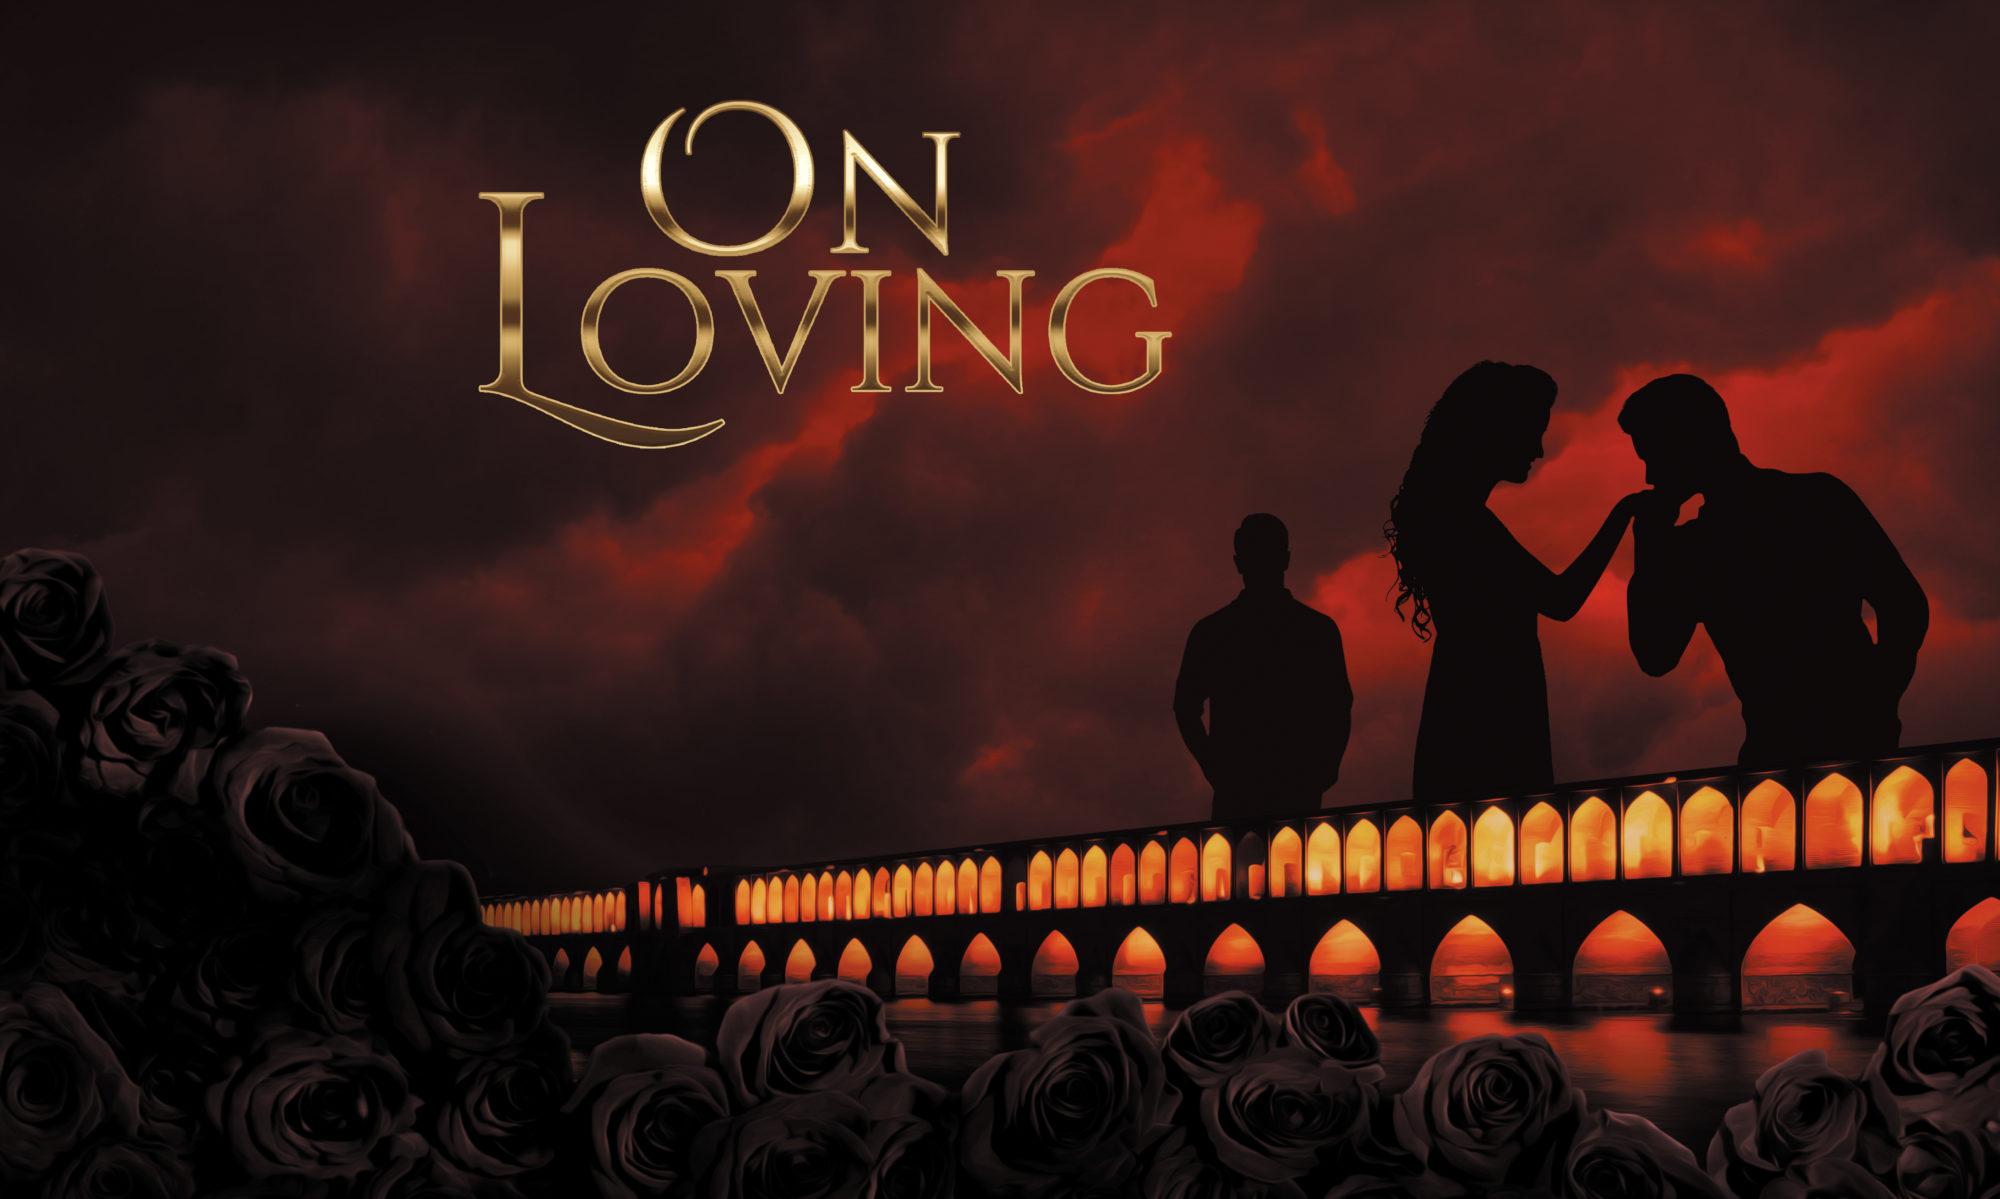 On Loving by Lili Naghdi